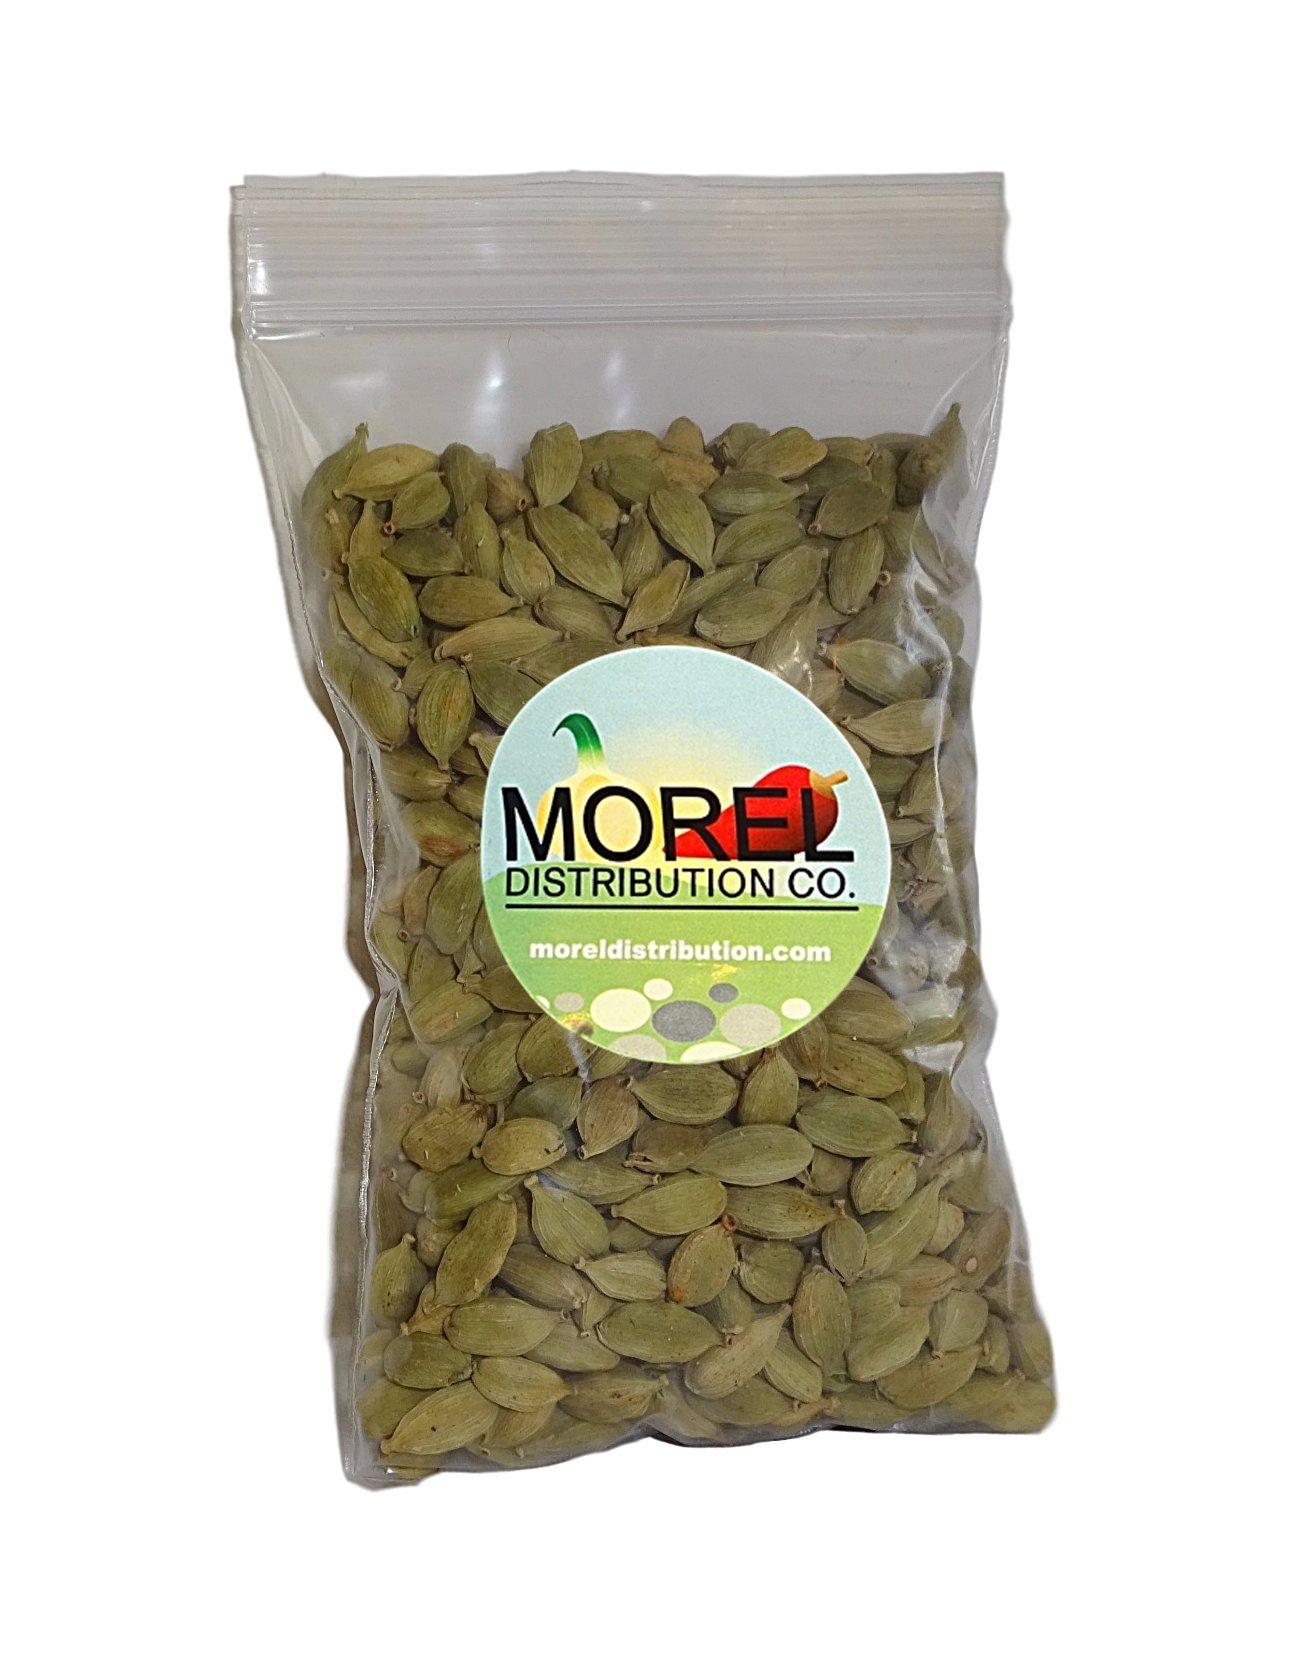 Whole Cardamom Pods/Seeds (Cardamomo) (1 oz, 2 oz, 4 oz, 6 oz, 8 oz, 12 oz, 1 lb, 2 lbs) (4 OZ) by Morel Distribution Company (Image #2)